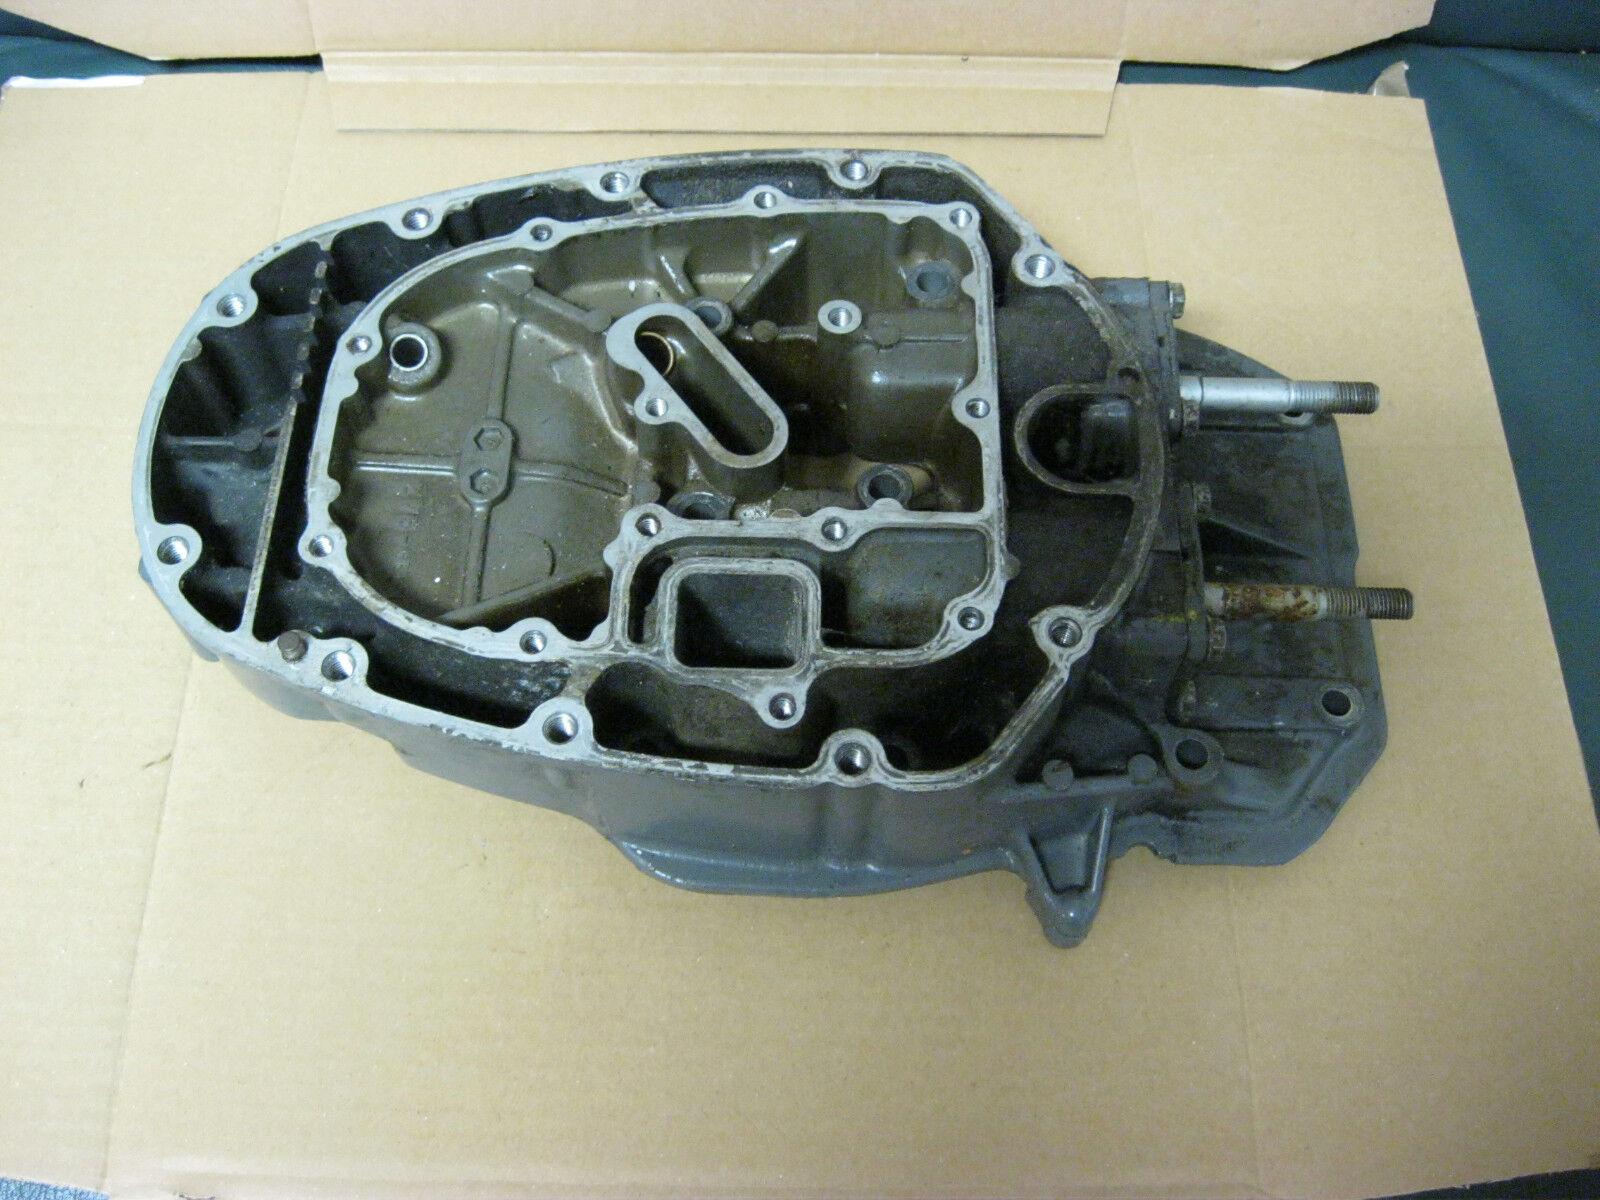 Gehäuse Motorgehäuse für Außenbord Motor Motor Außenbord Honda BF50 A 46d35a